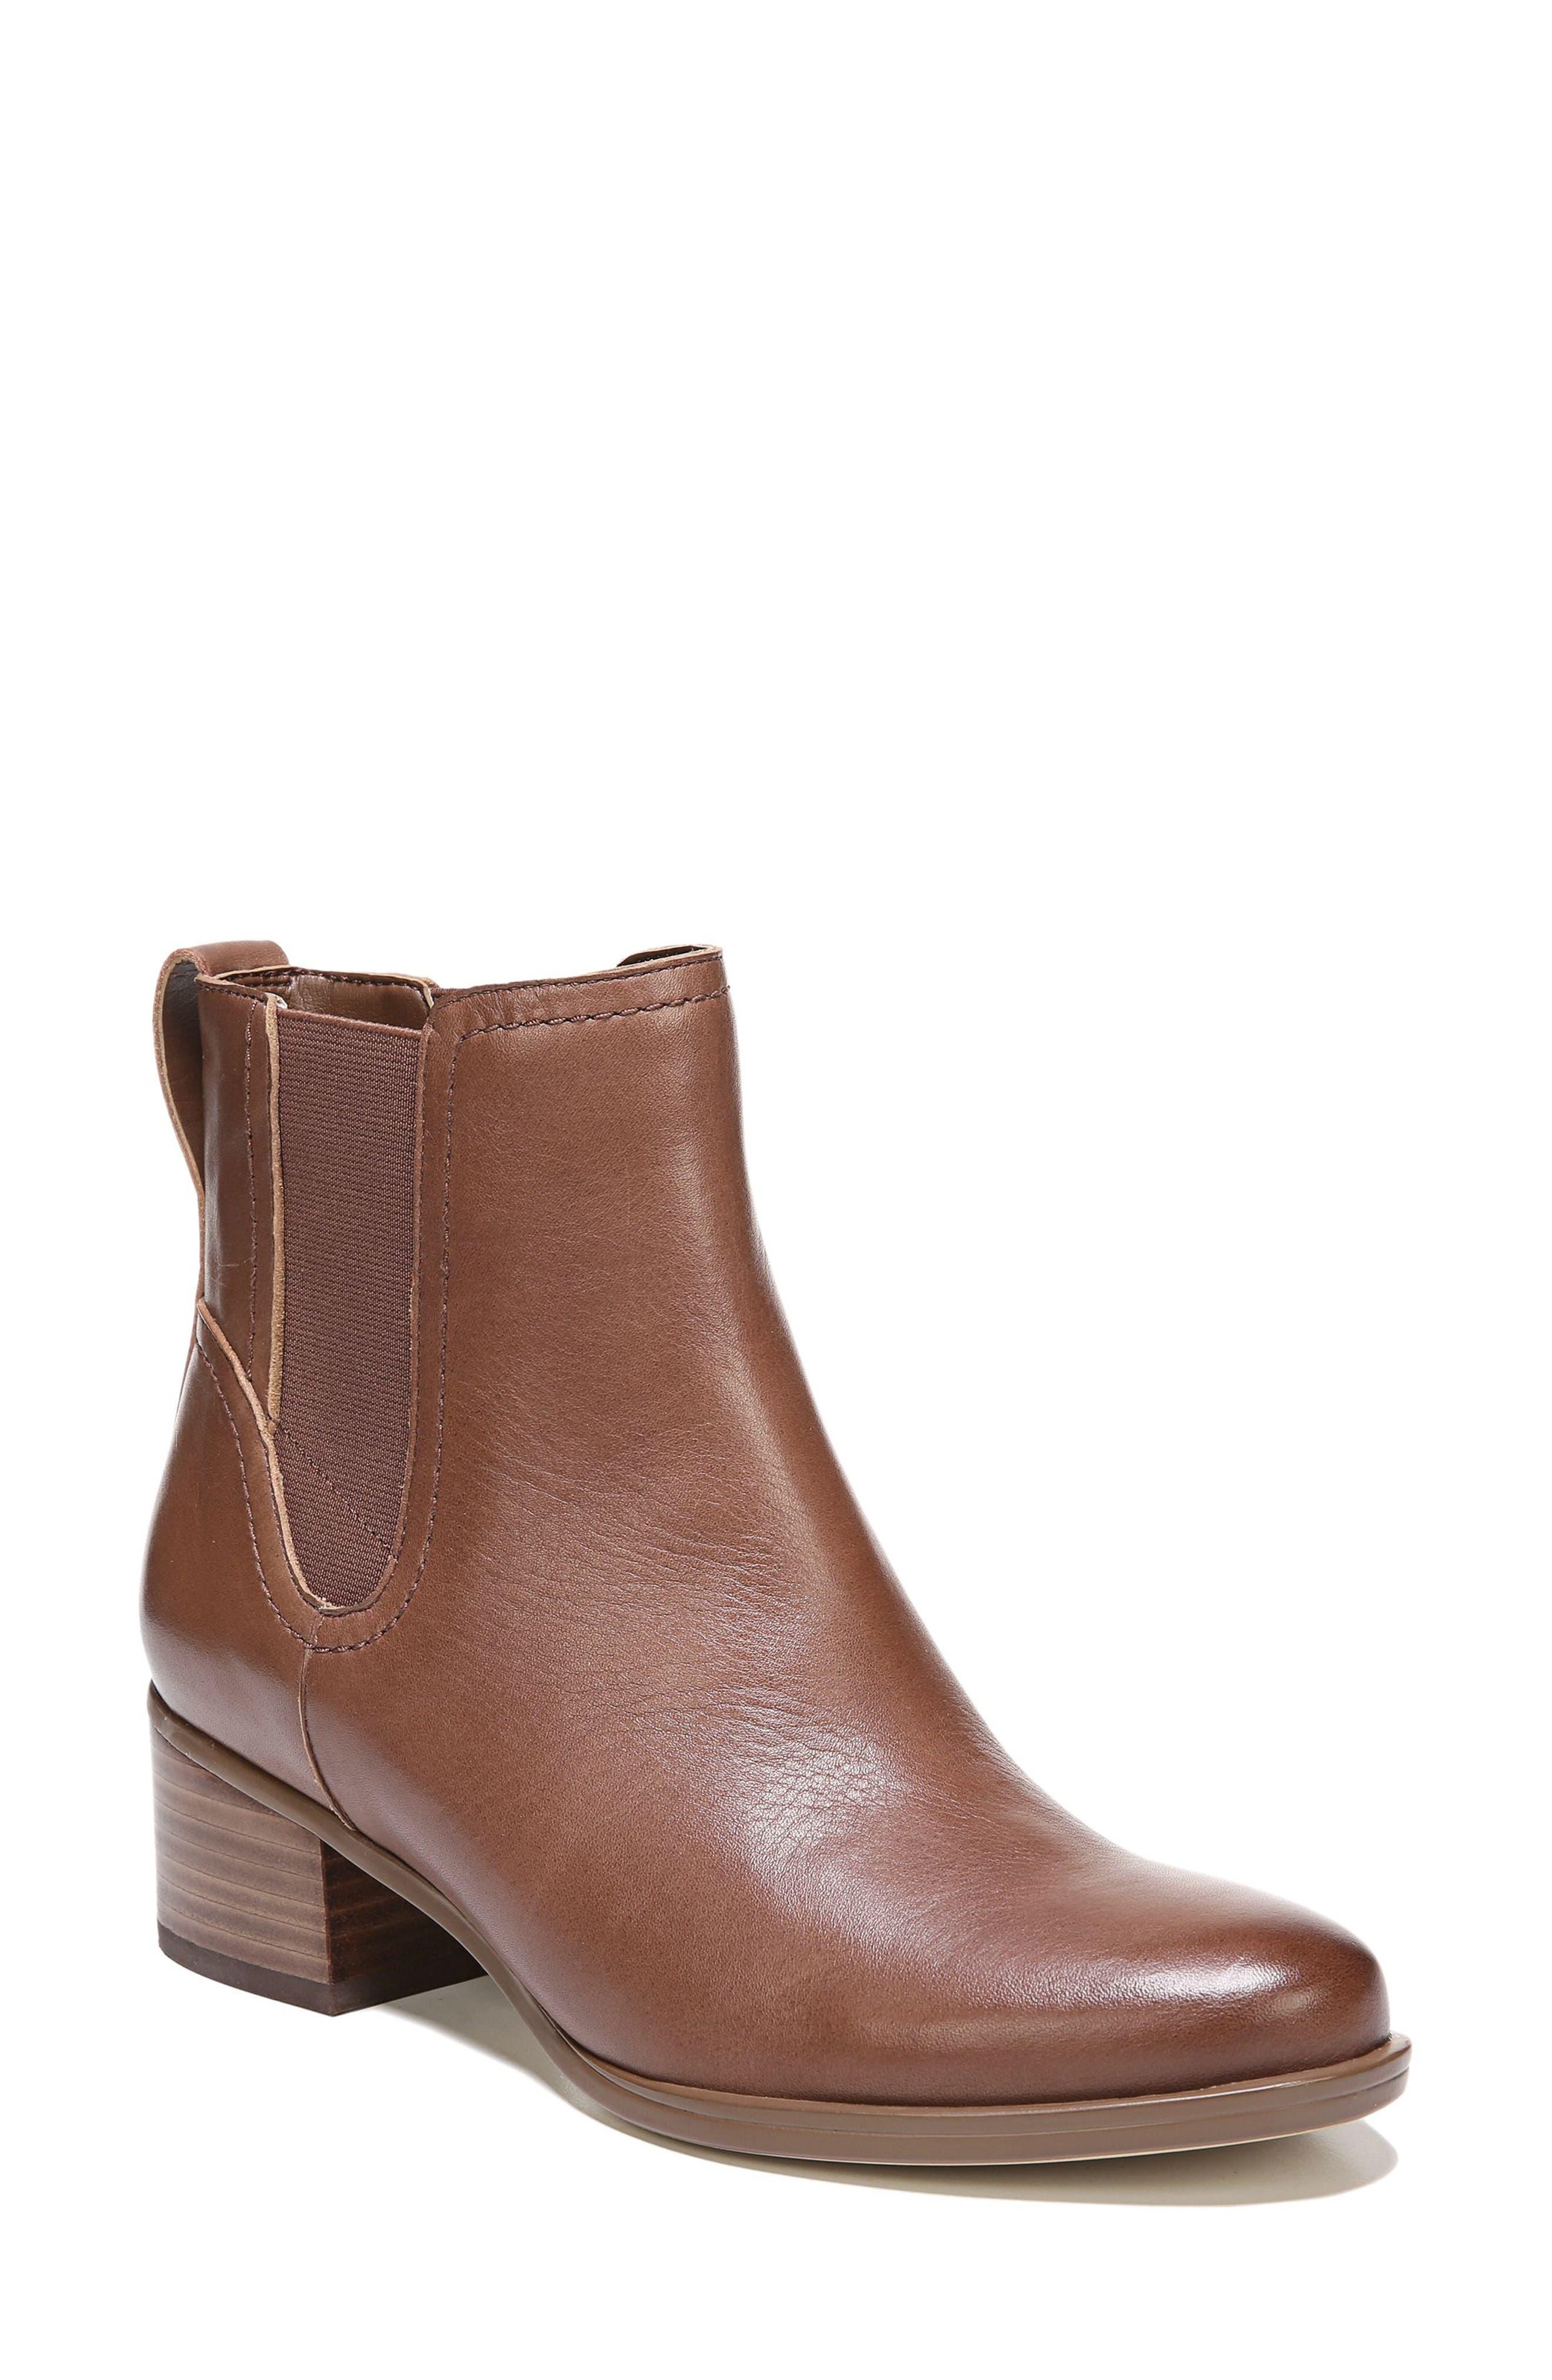 Dallas Chelsea Boot,                         Main,                         color, Coffee Bean Leather